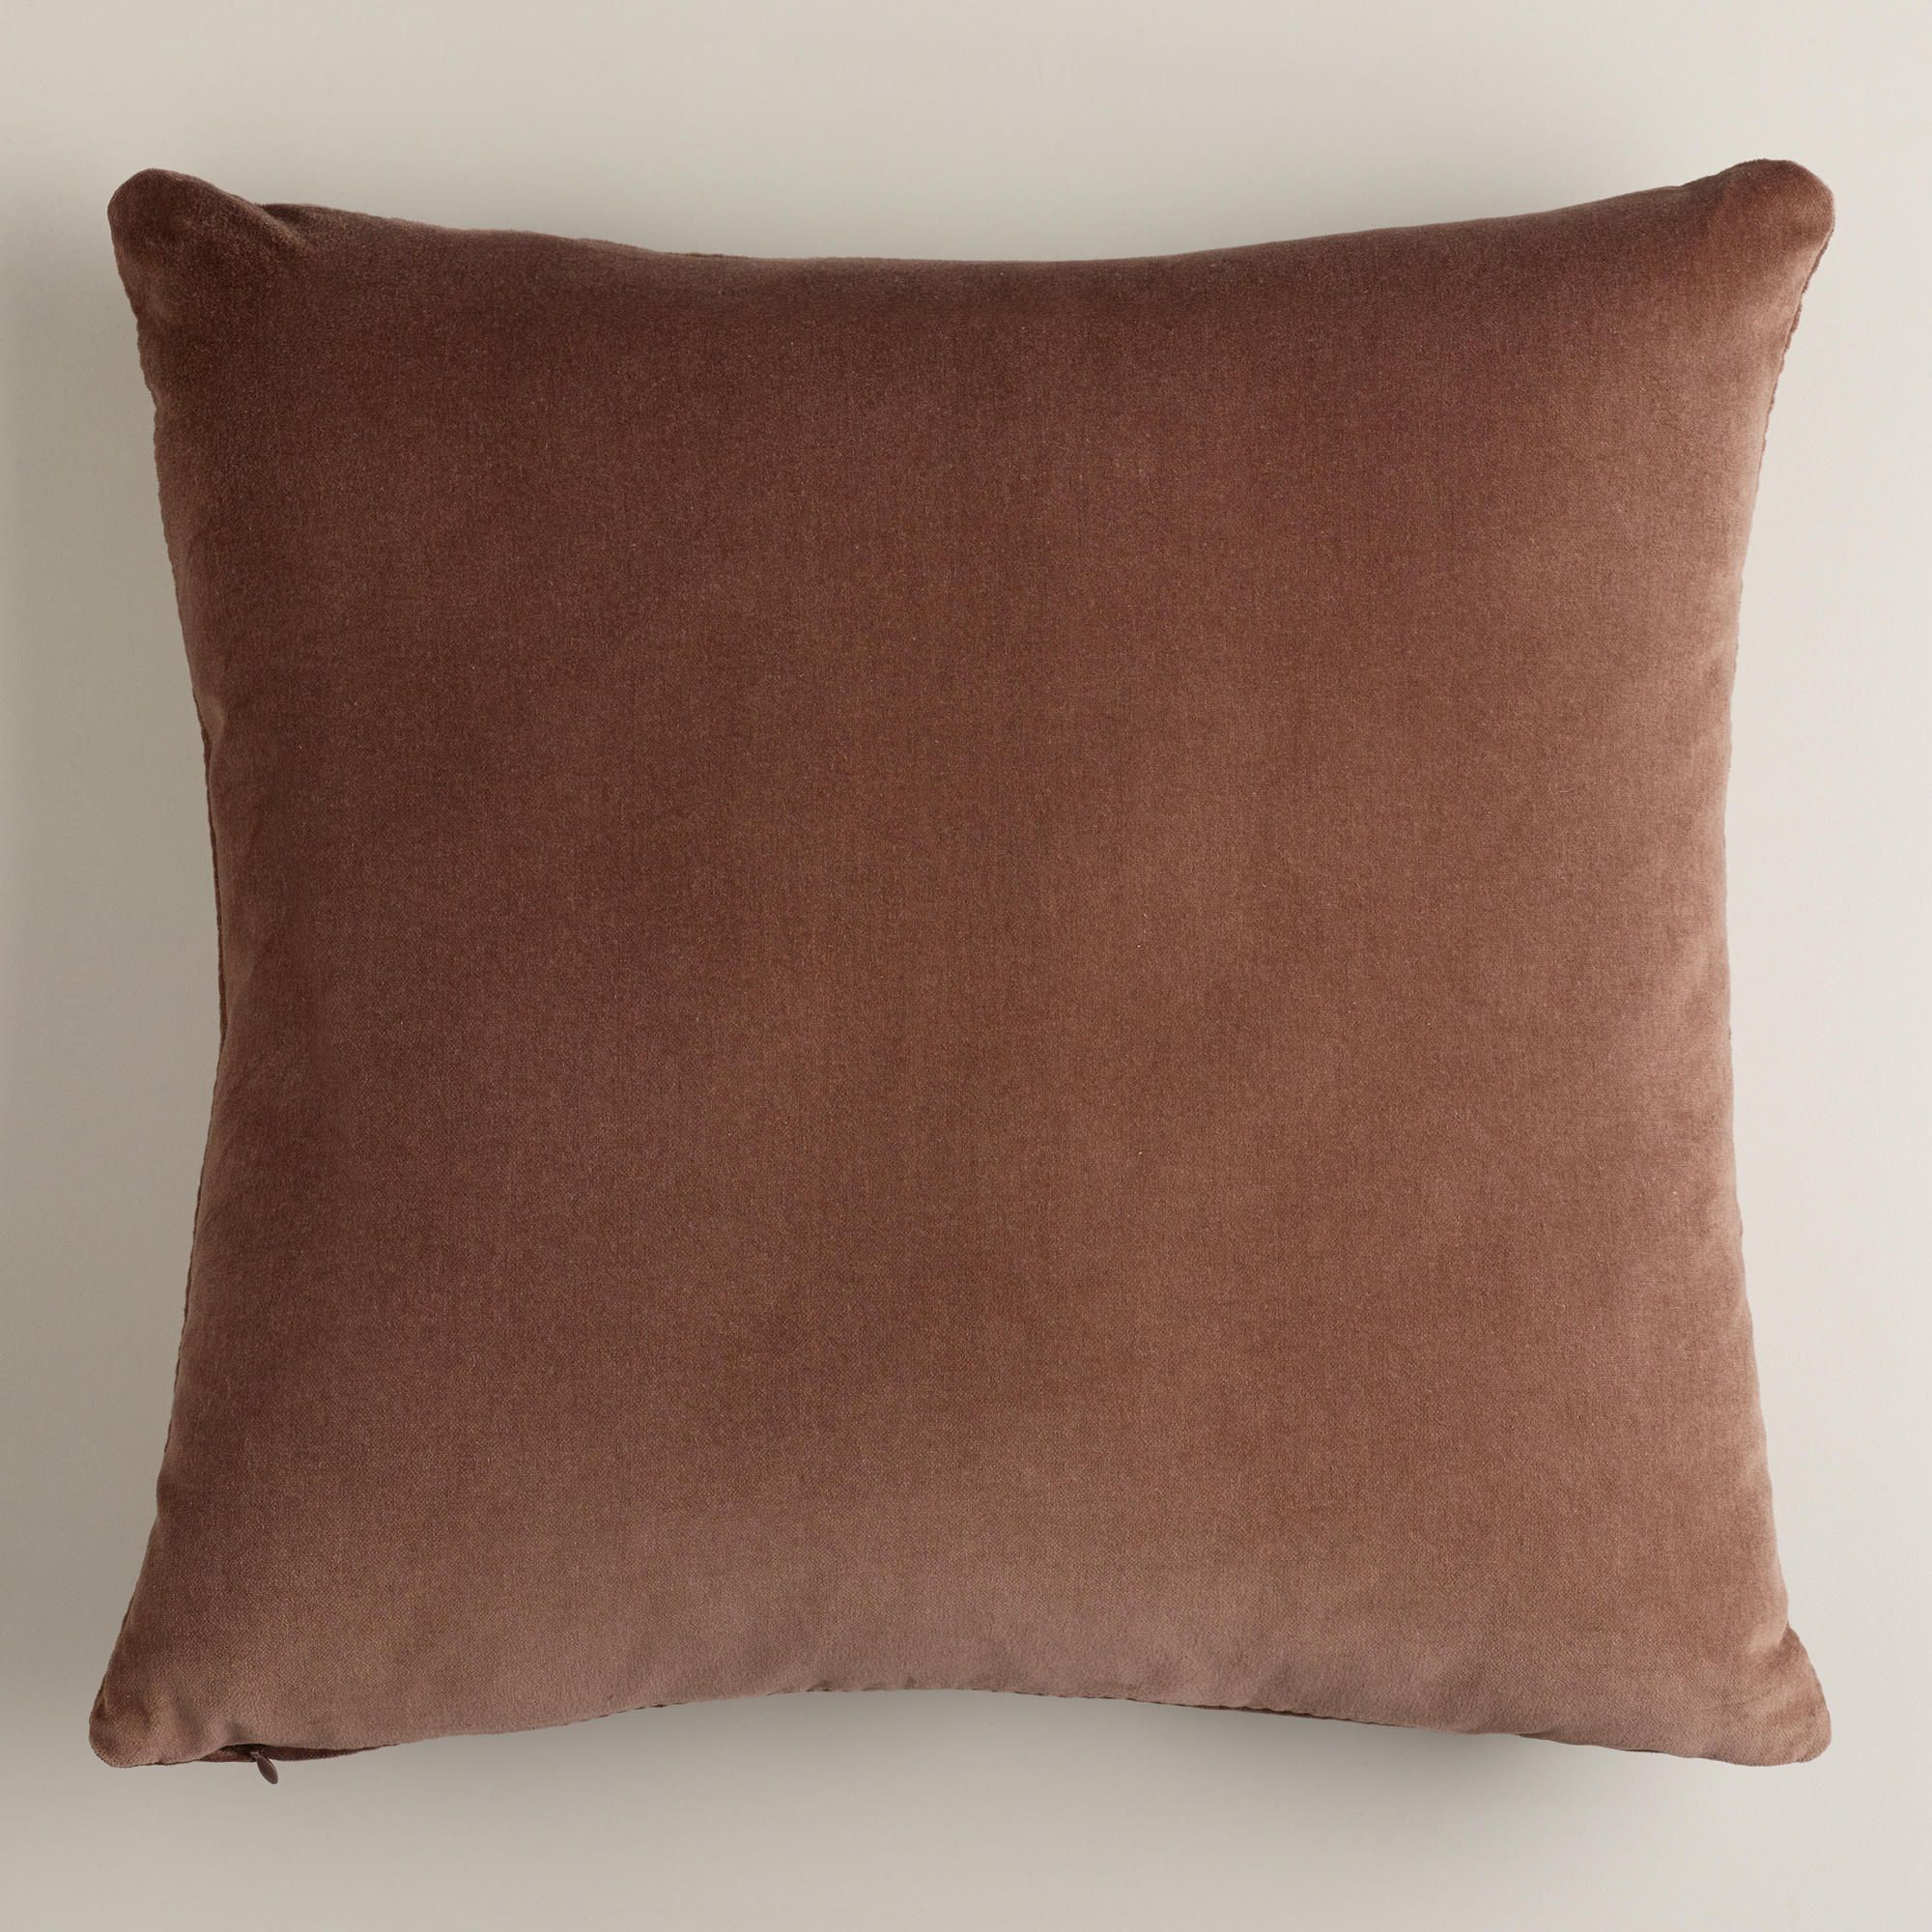 Rain Drum Velvet Throw Pillows (Cost Plus World Market) (15 ...